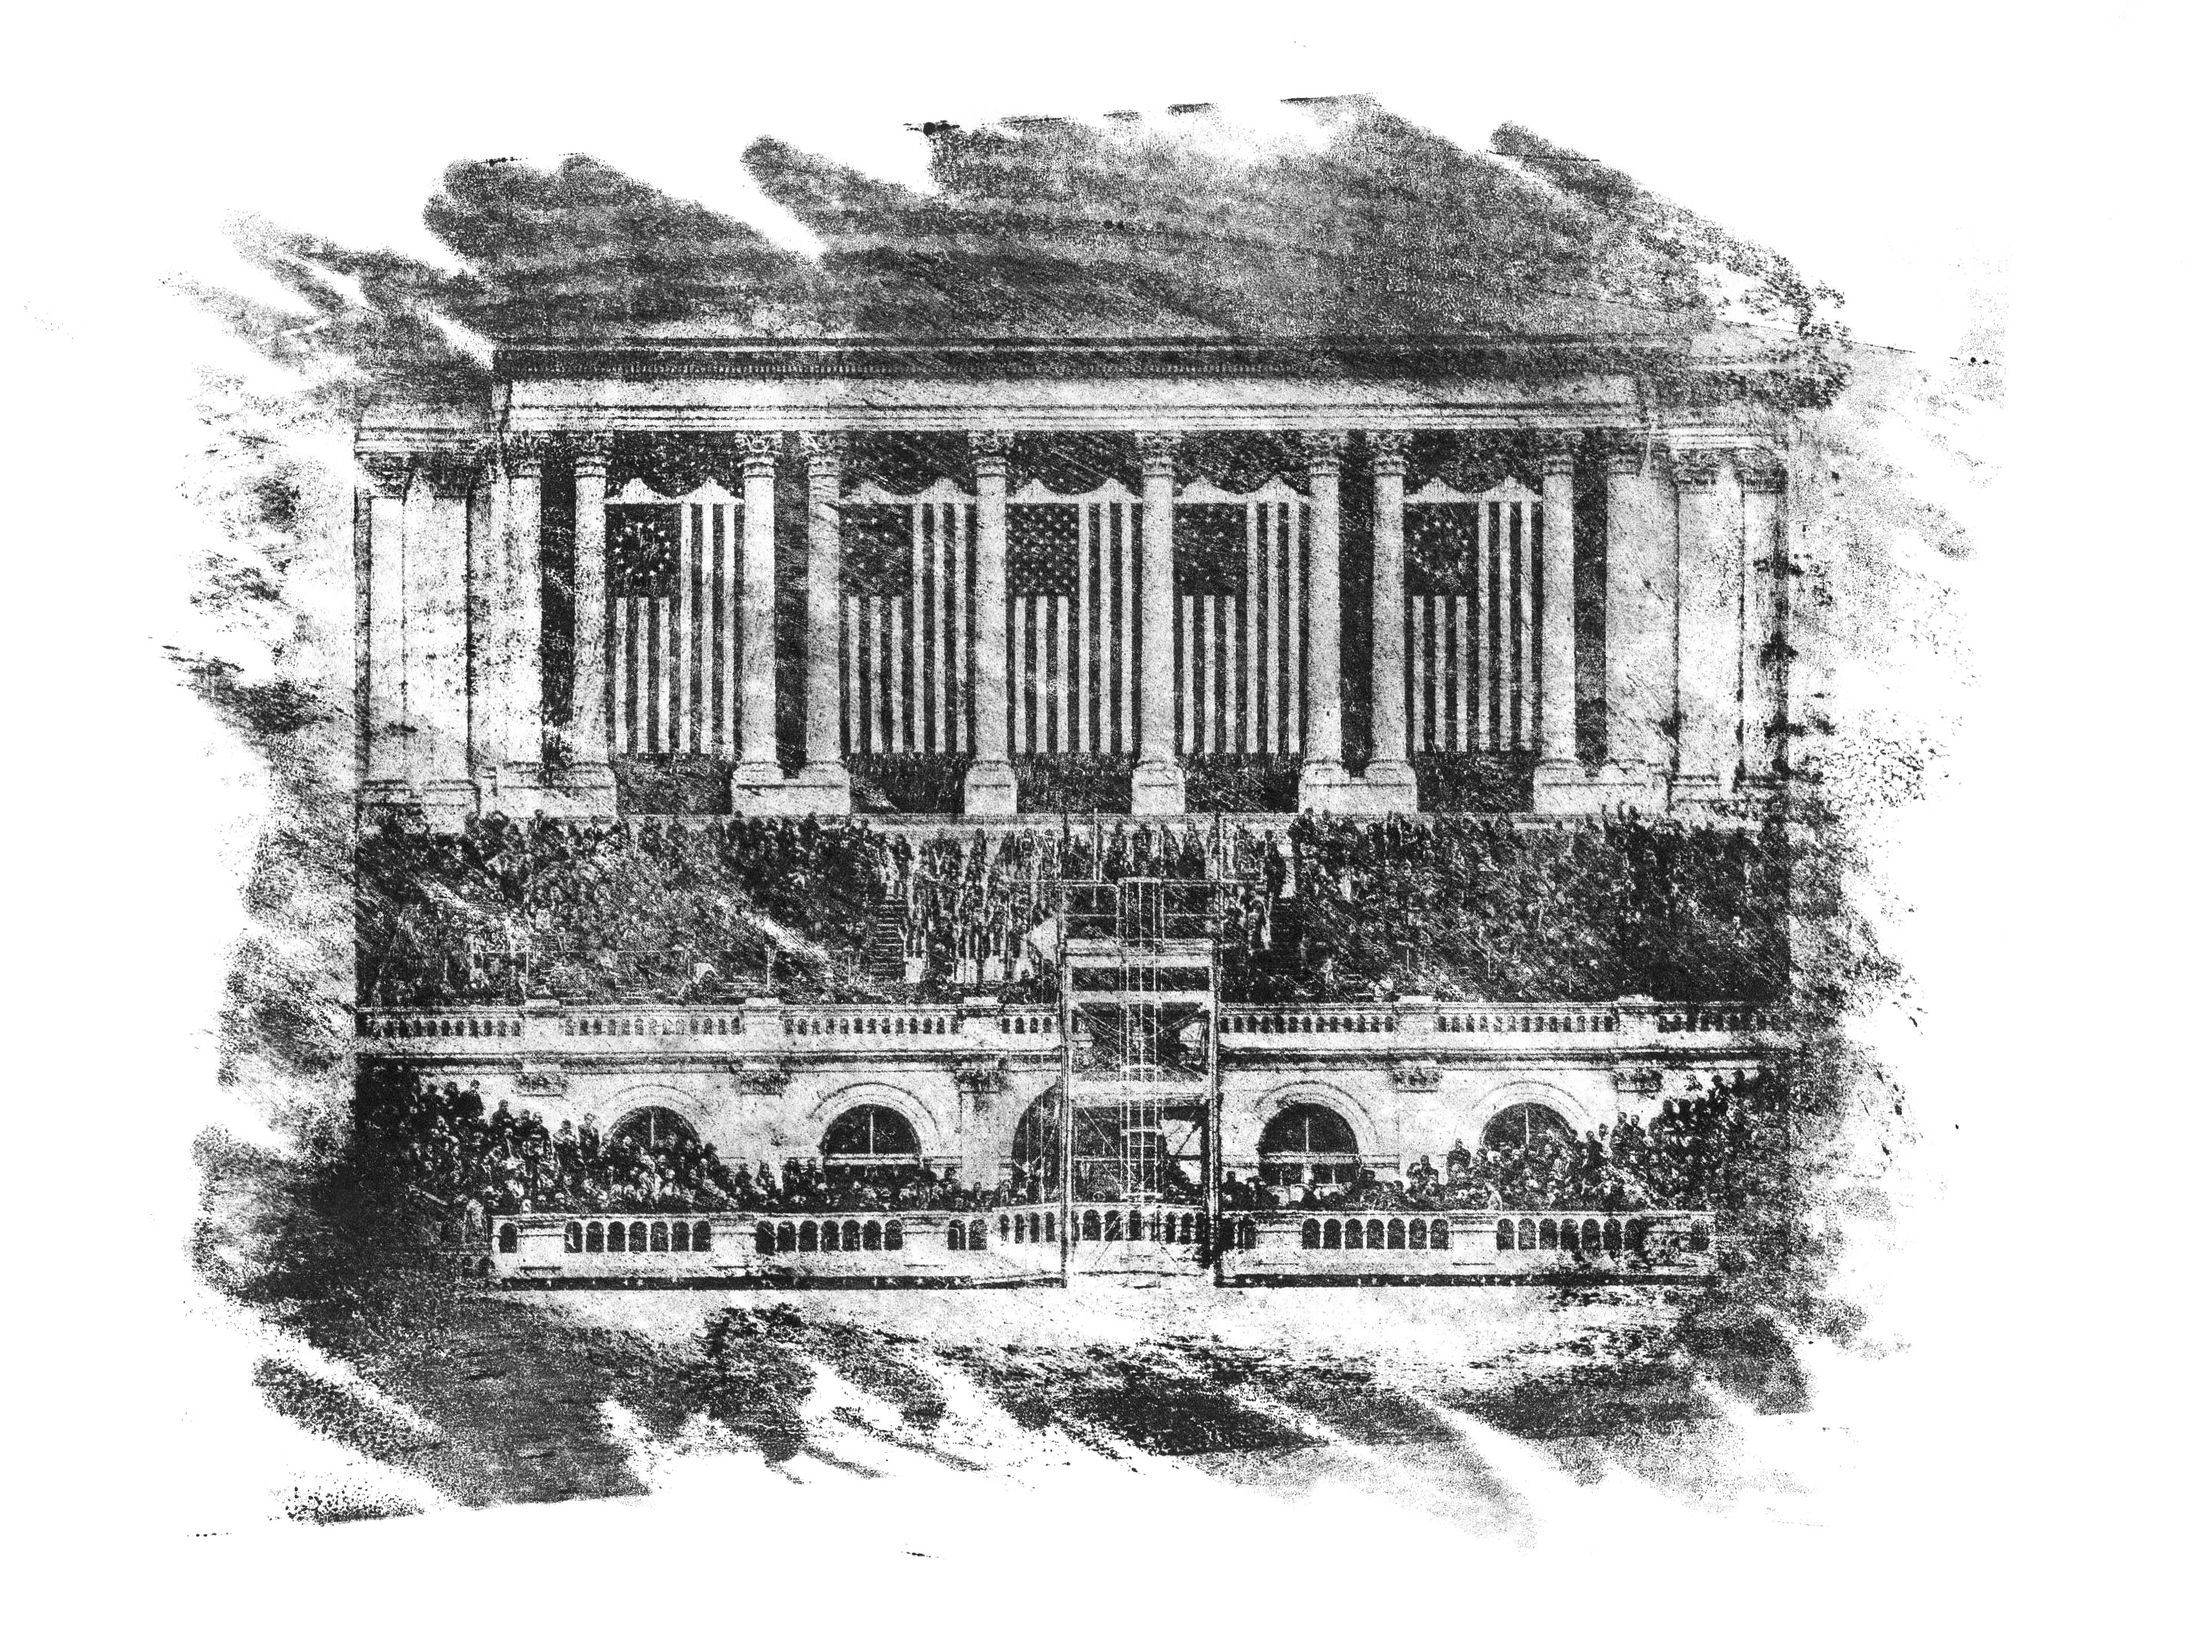 1/20/17, Capitol, Washington, D.C.